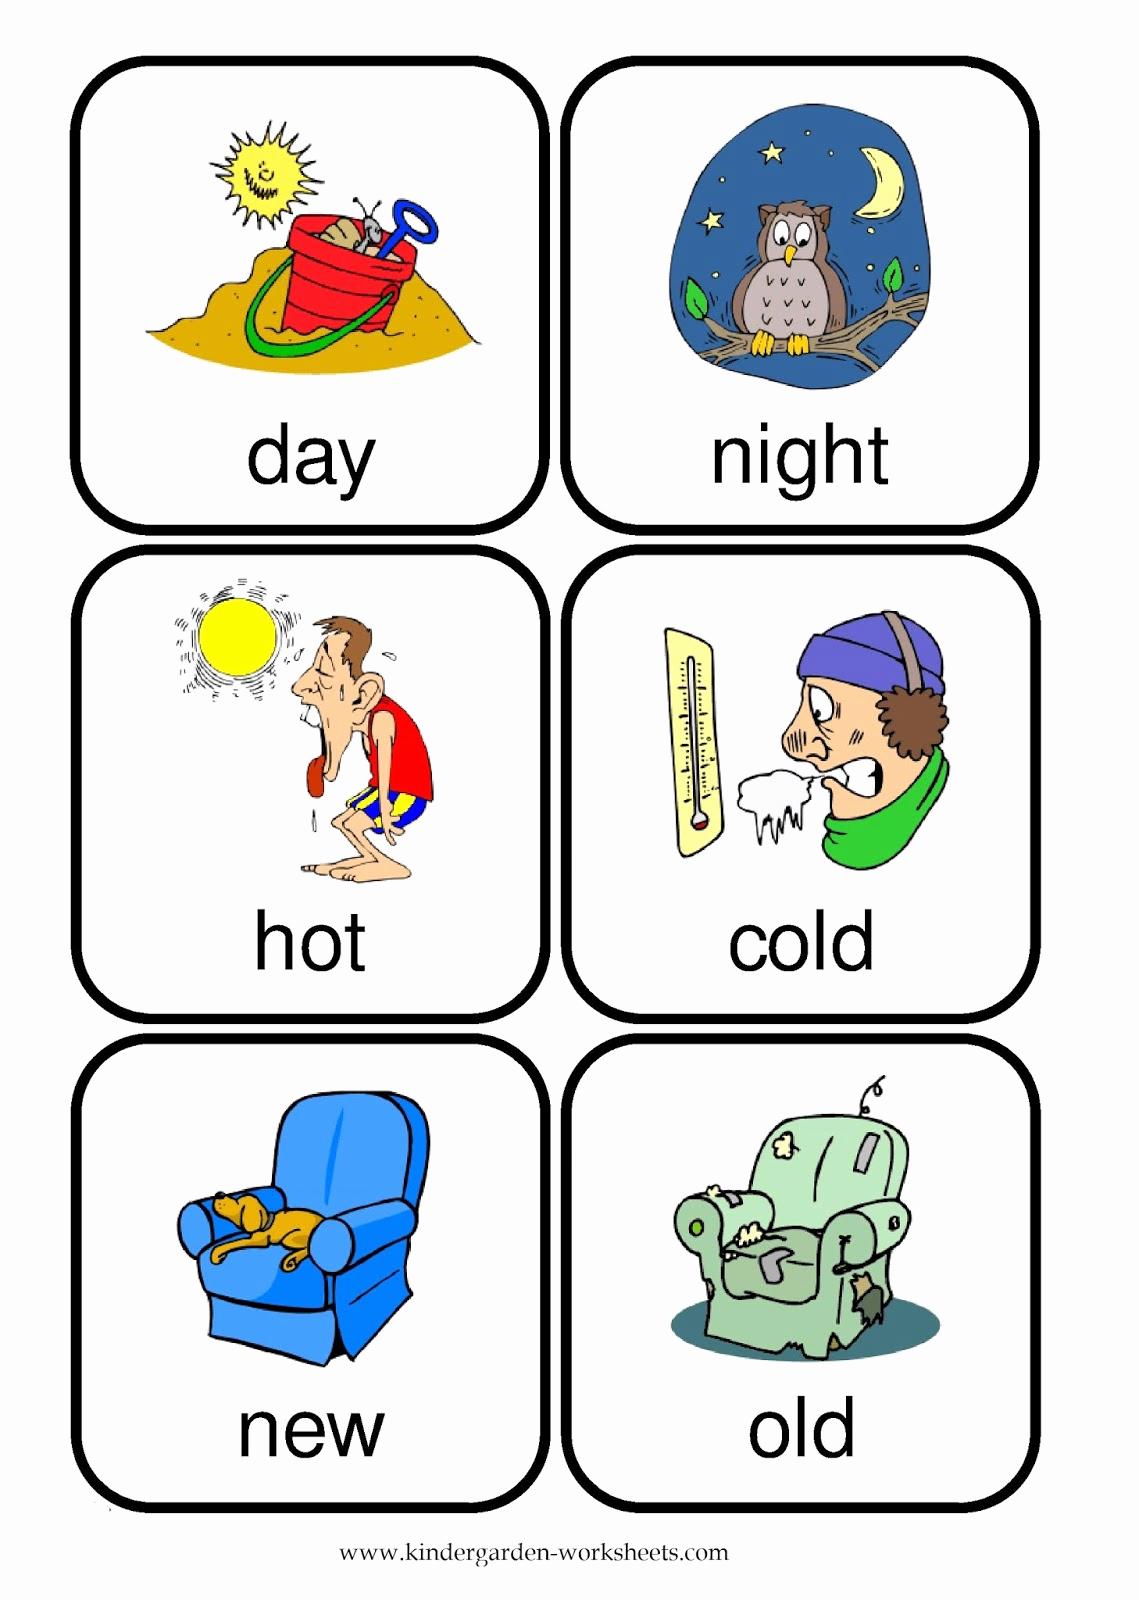 Opposites Worksheet for Kindergarten Luxury Kindergarten Worksheets Flashcards Opposite Words